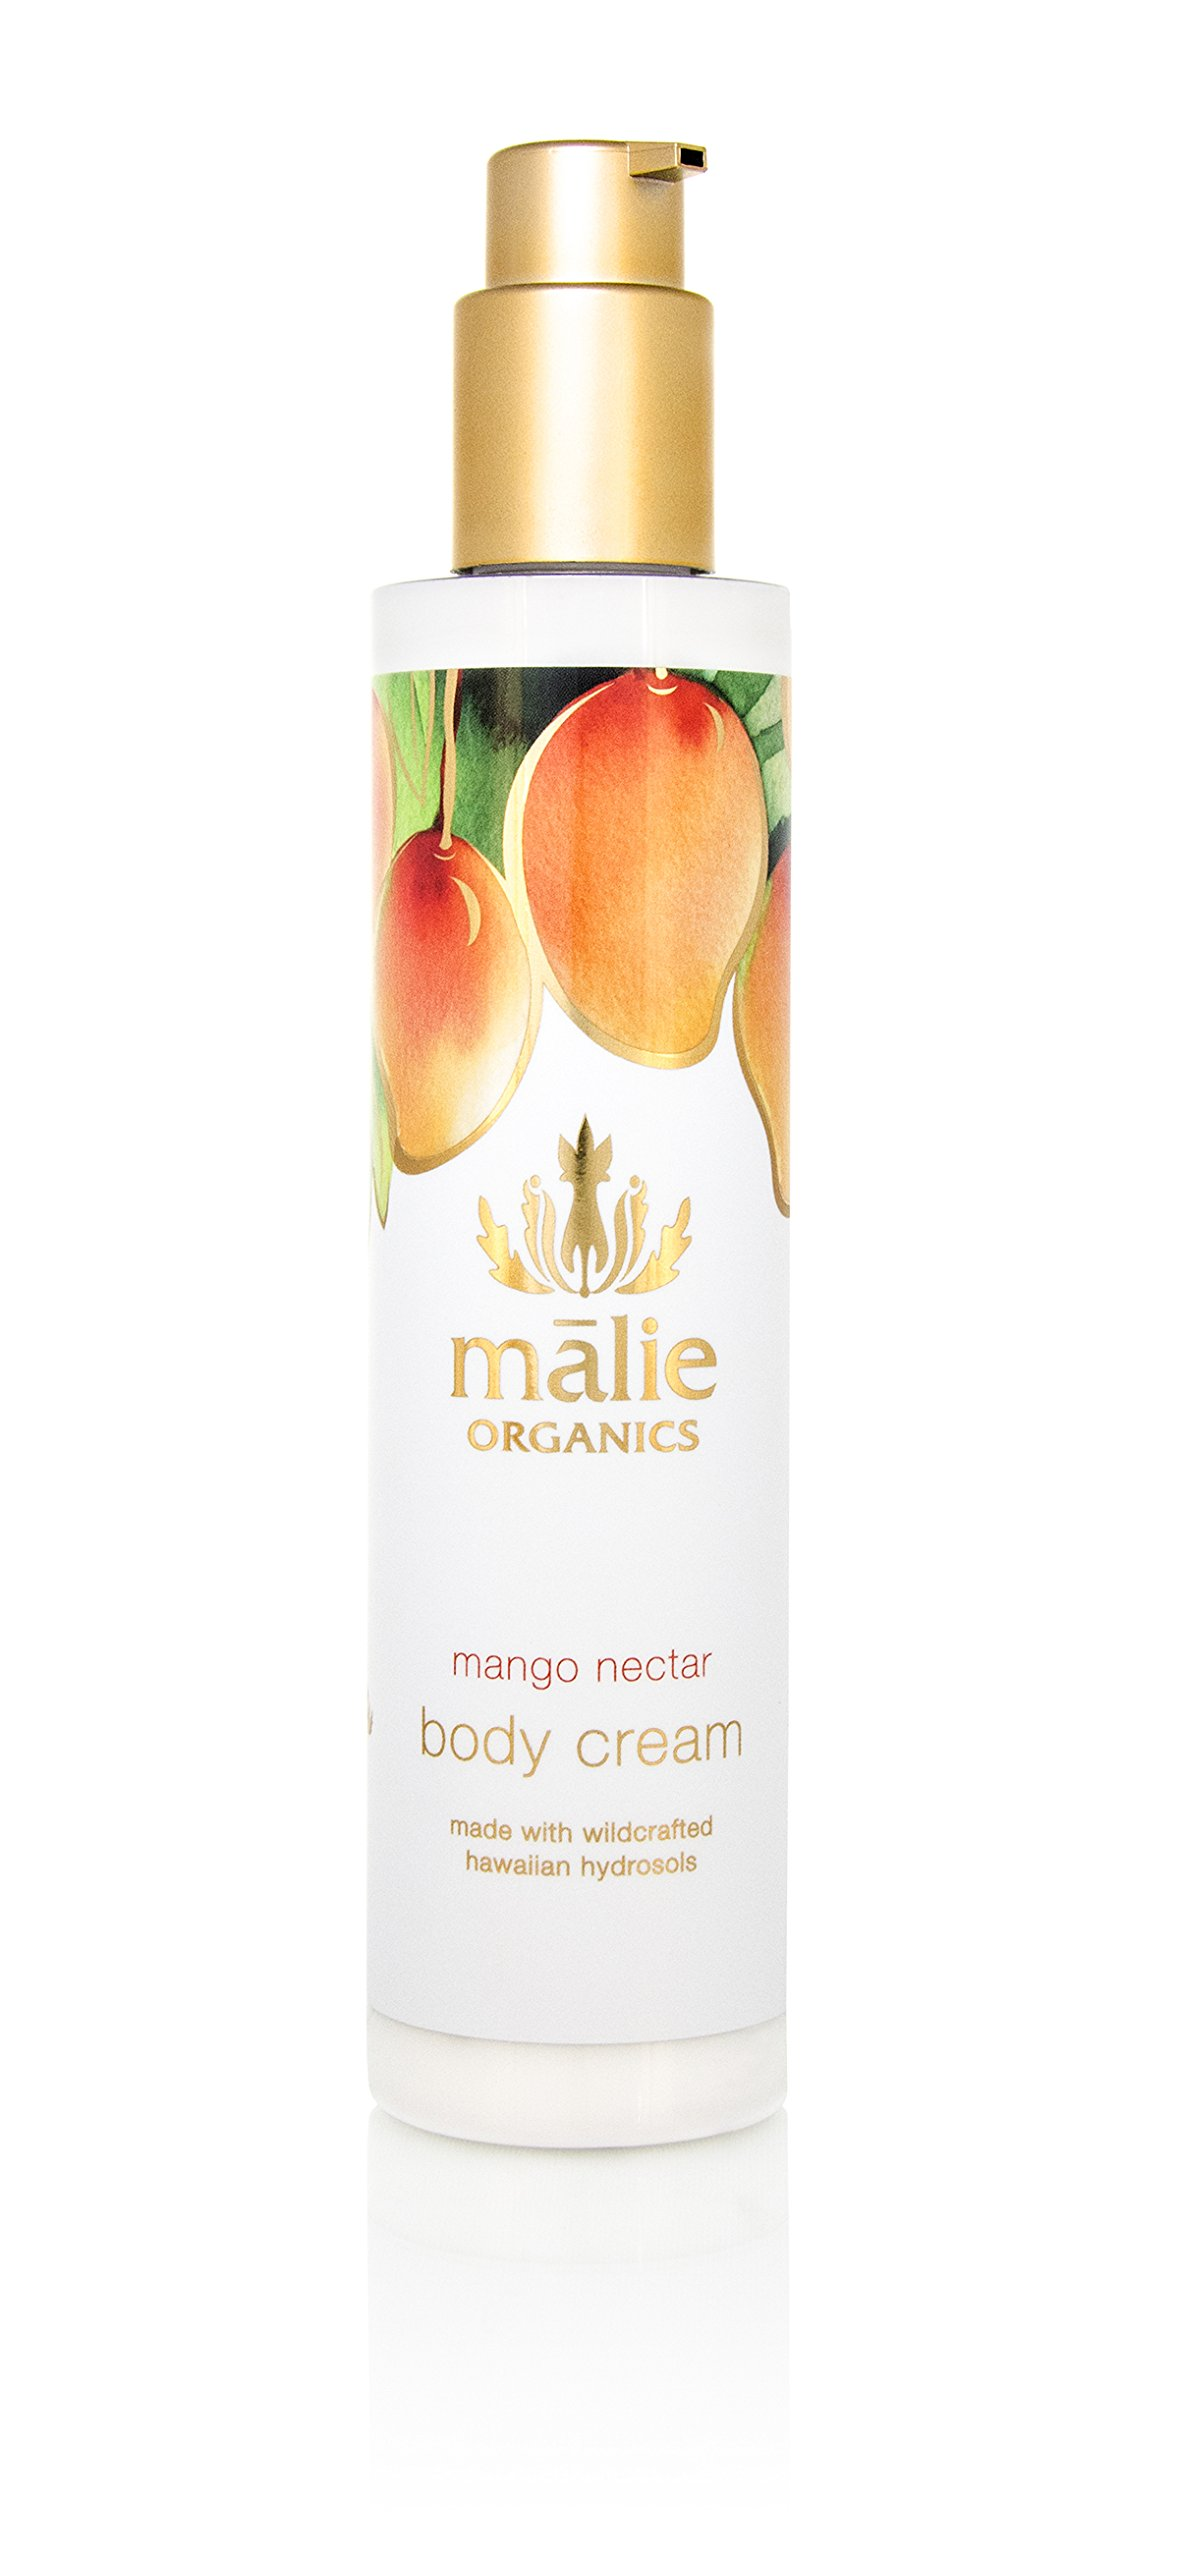 Malie Organics Body Cream - Mango Nectar